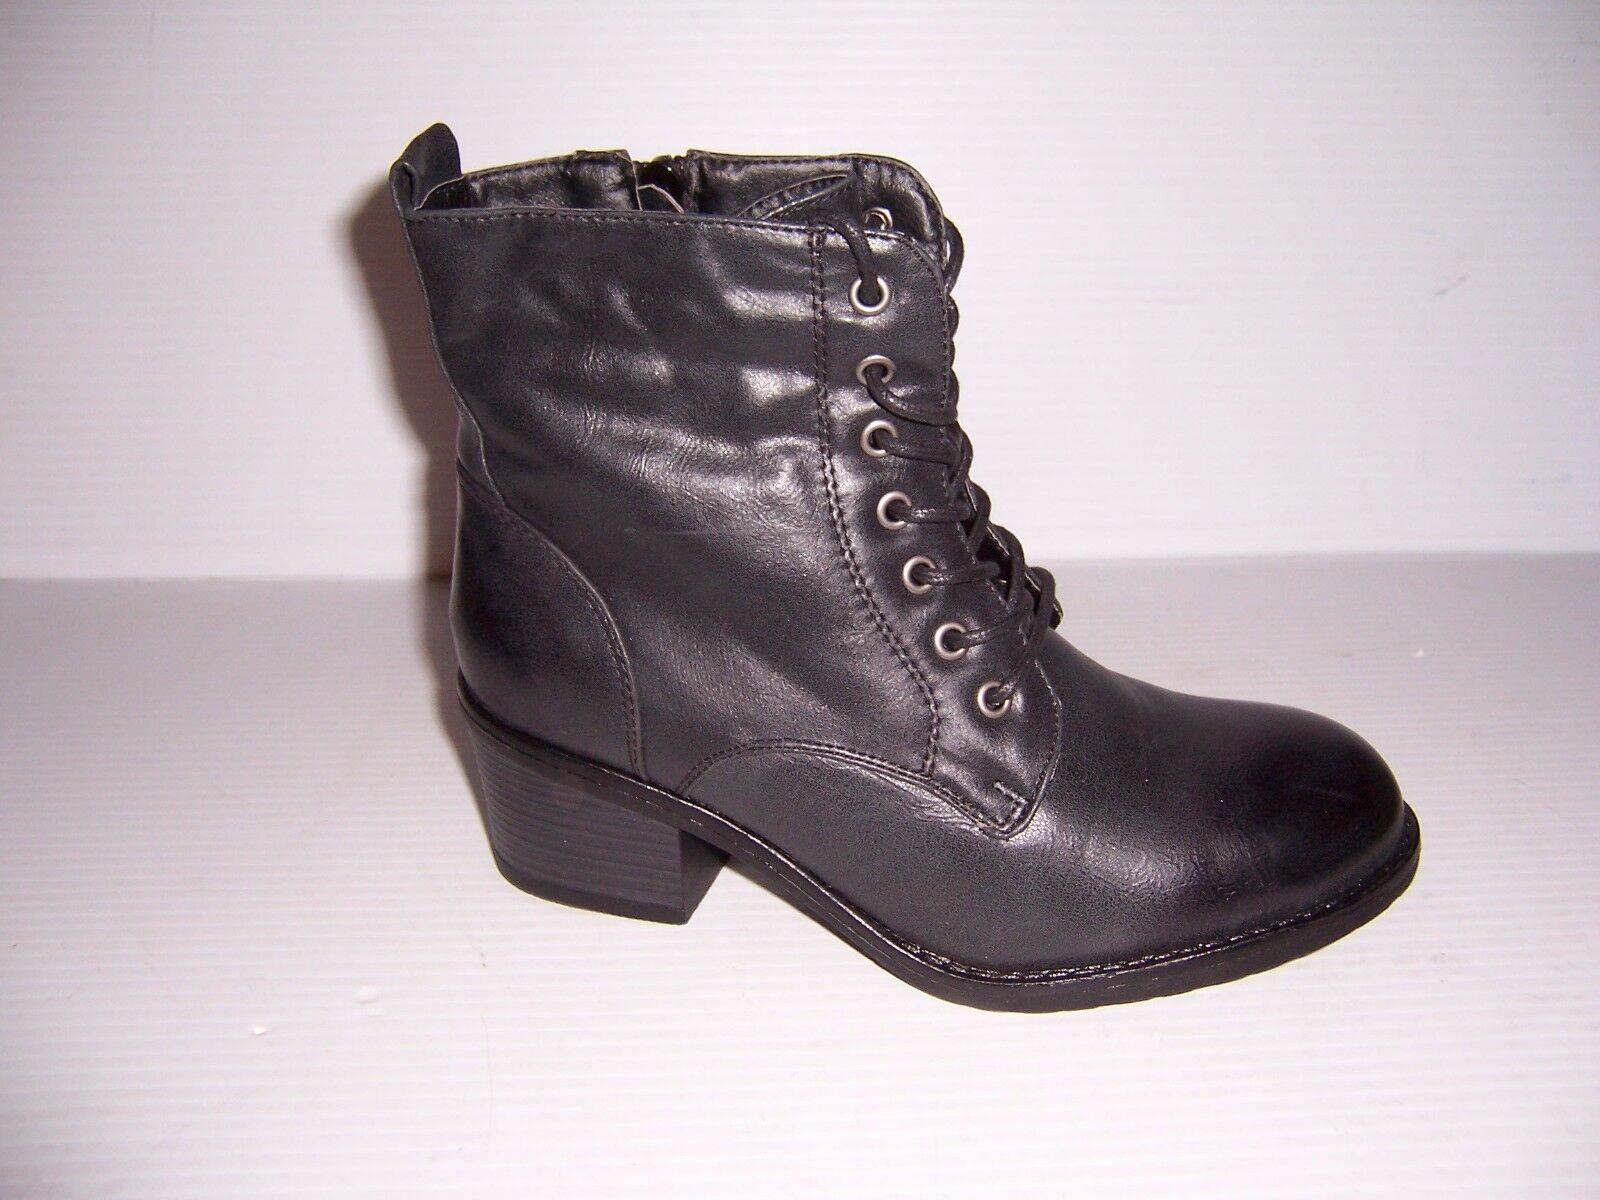 HOTCAKES Women's Black Flipper Granny Ankle Designer Boots Various Sizes NEW!